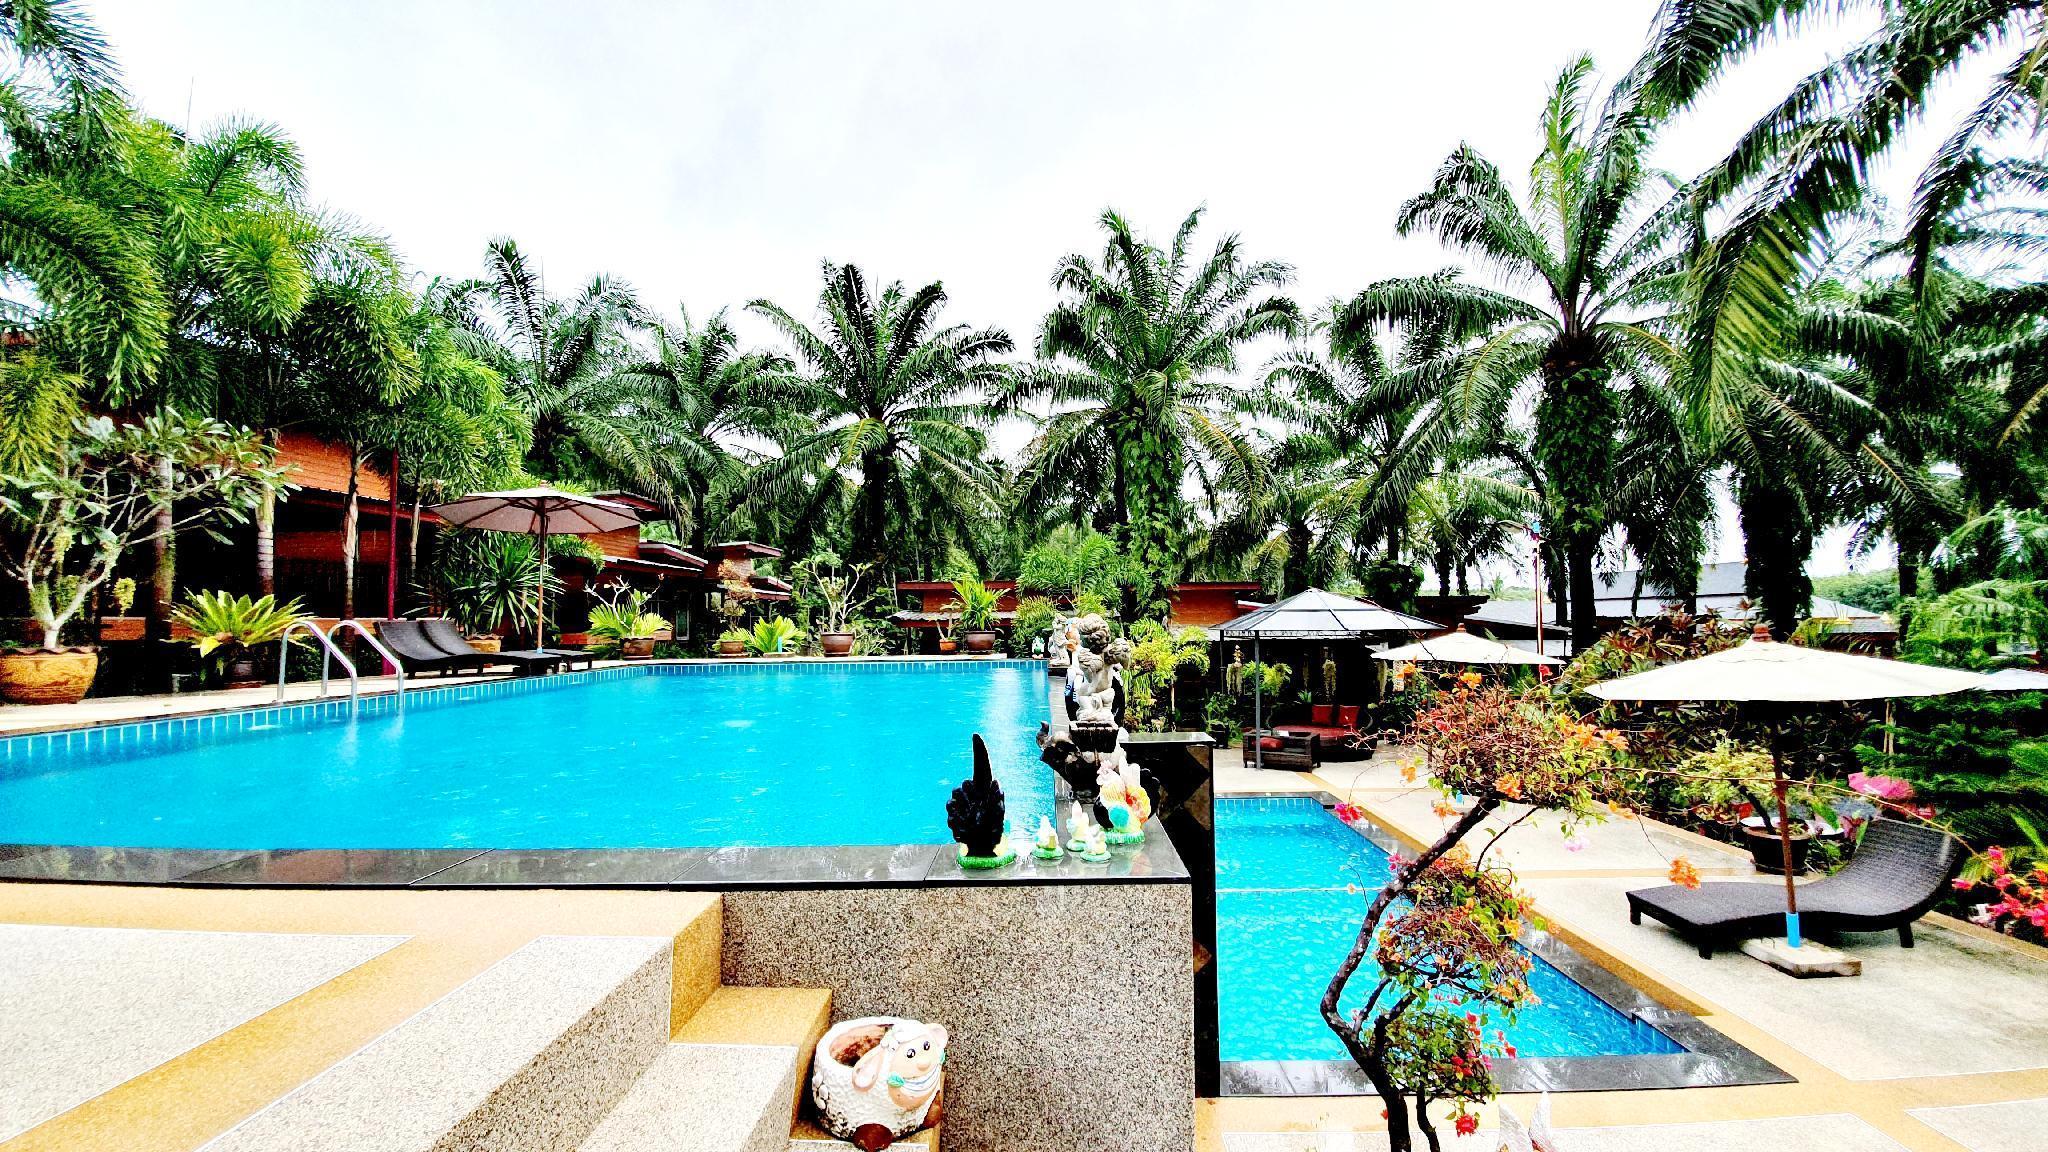 Palmthien Pool Villa Aonang ปาล์มเทียน พูล วิลลา อ่าวนาง